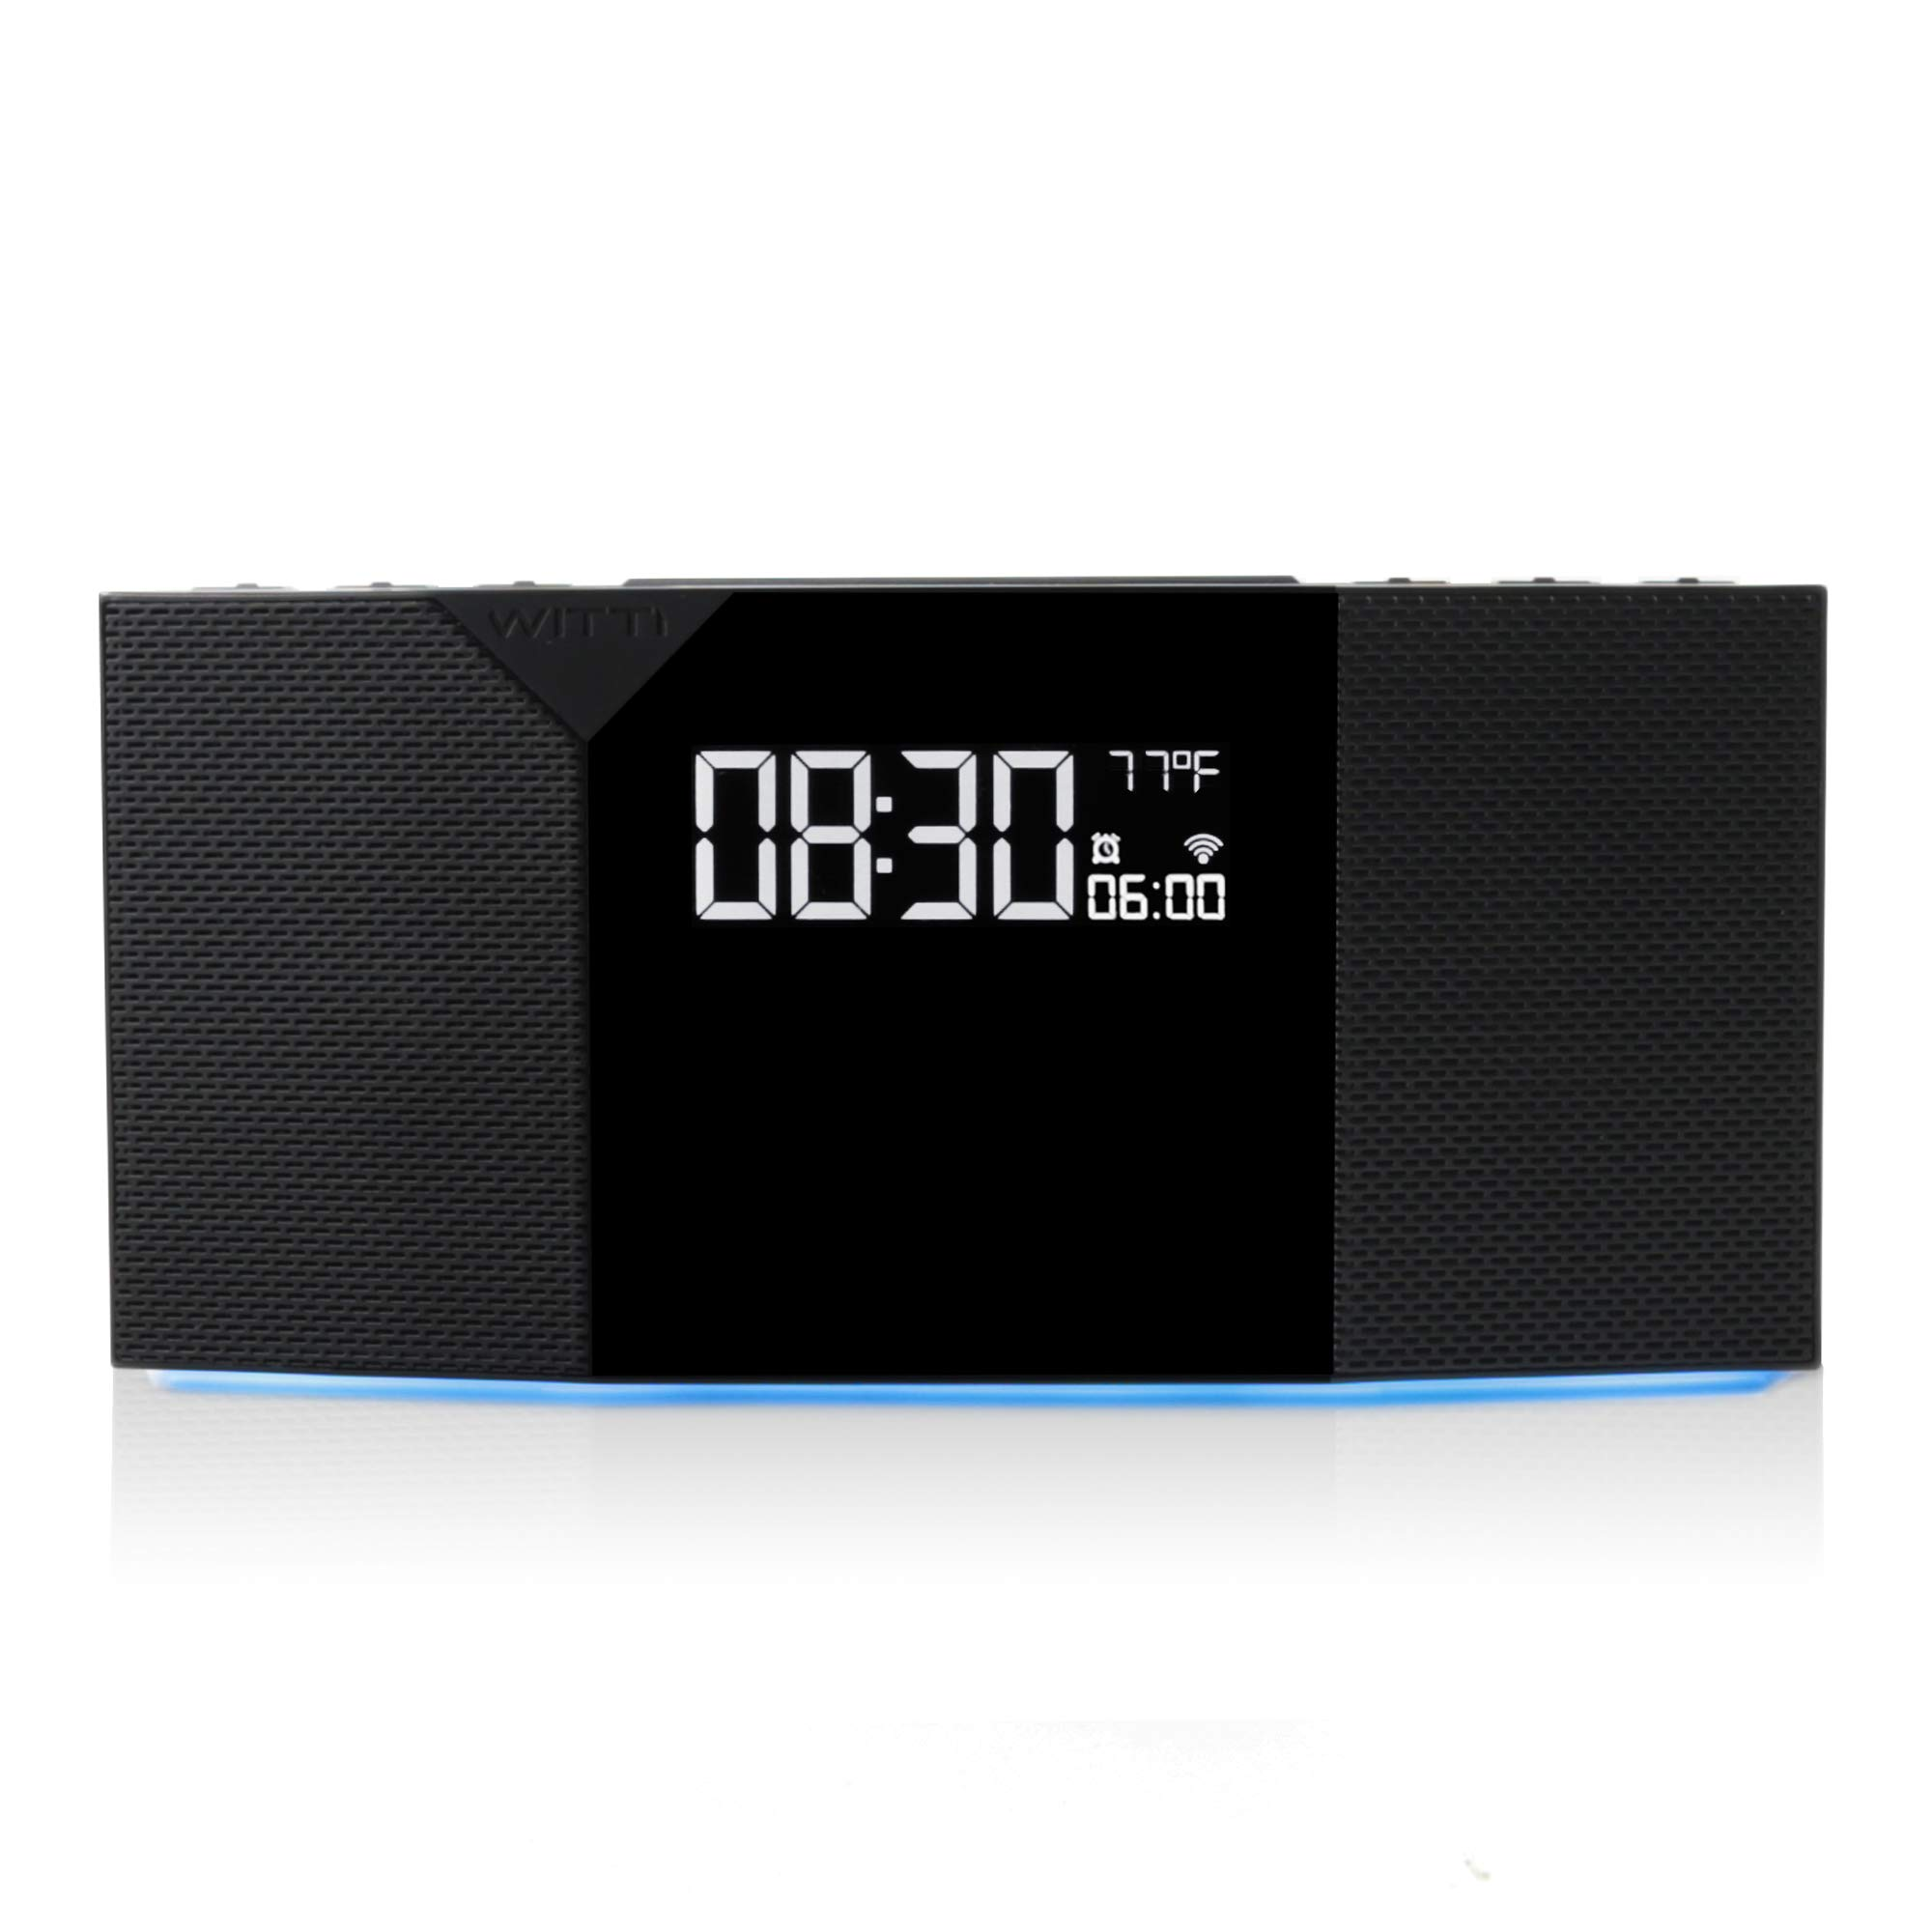 WITTI BEDDI 2, Intelligent Alarm Clock with White Noise Generator by WITTI